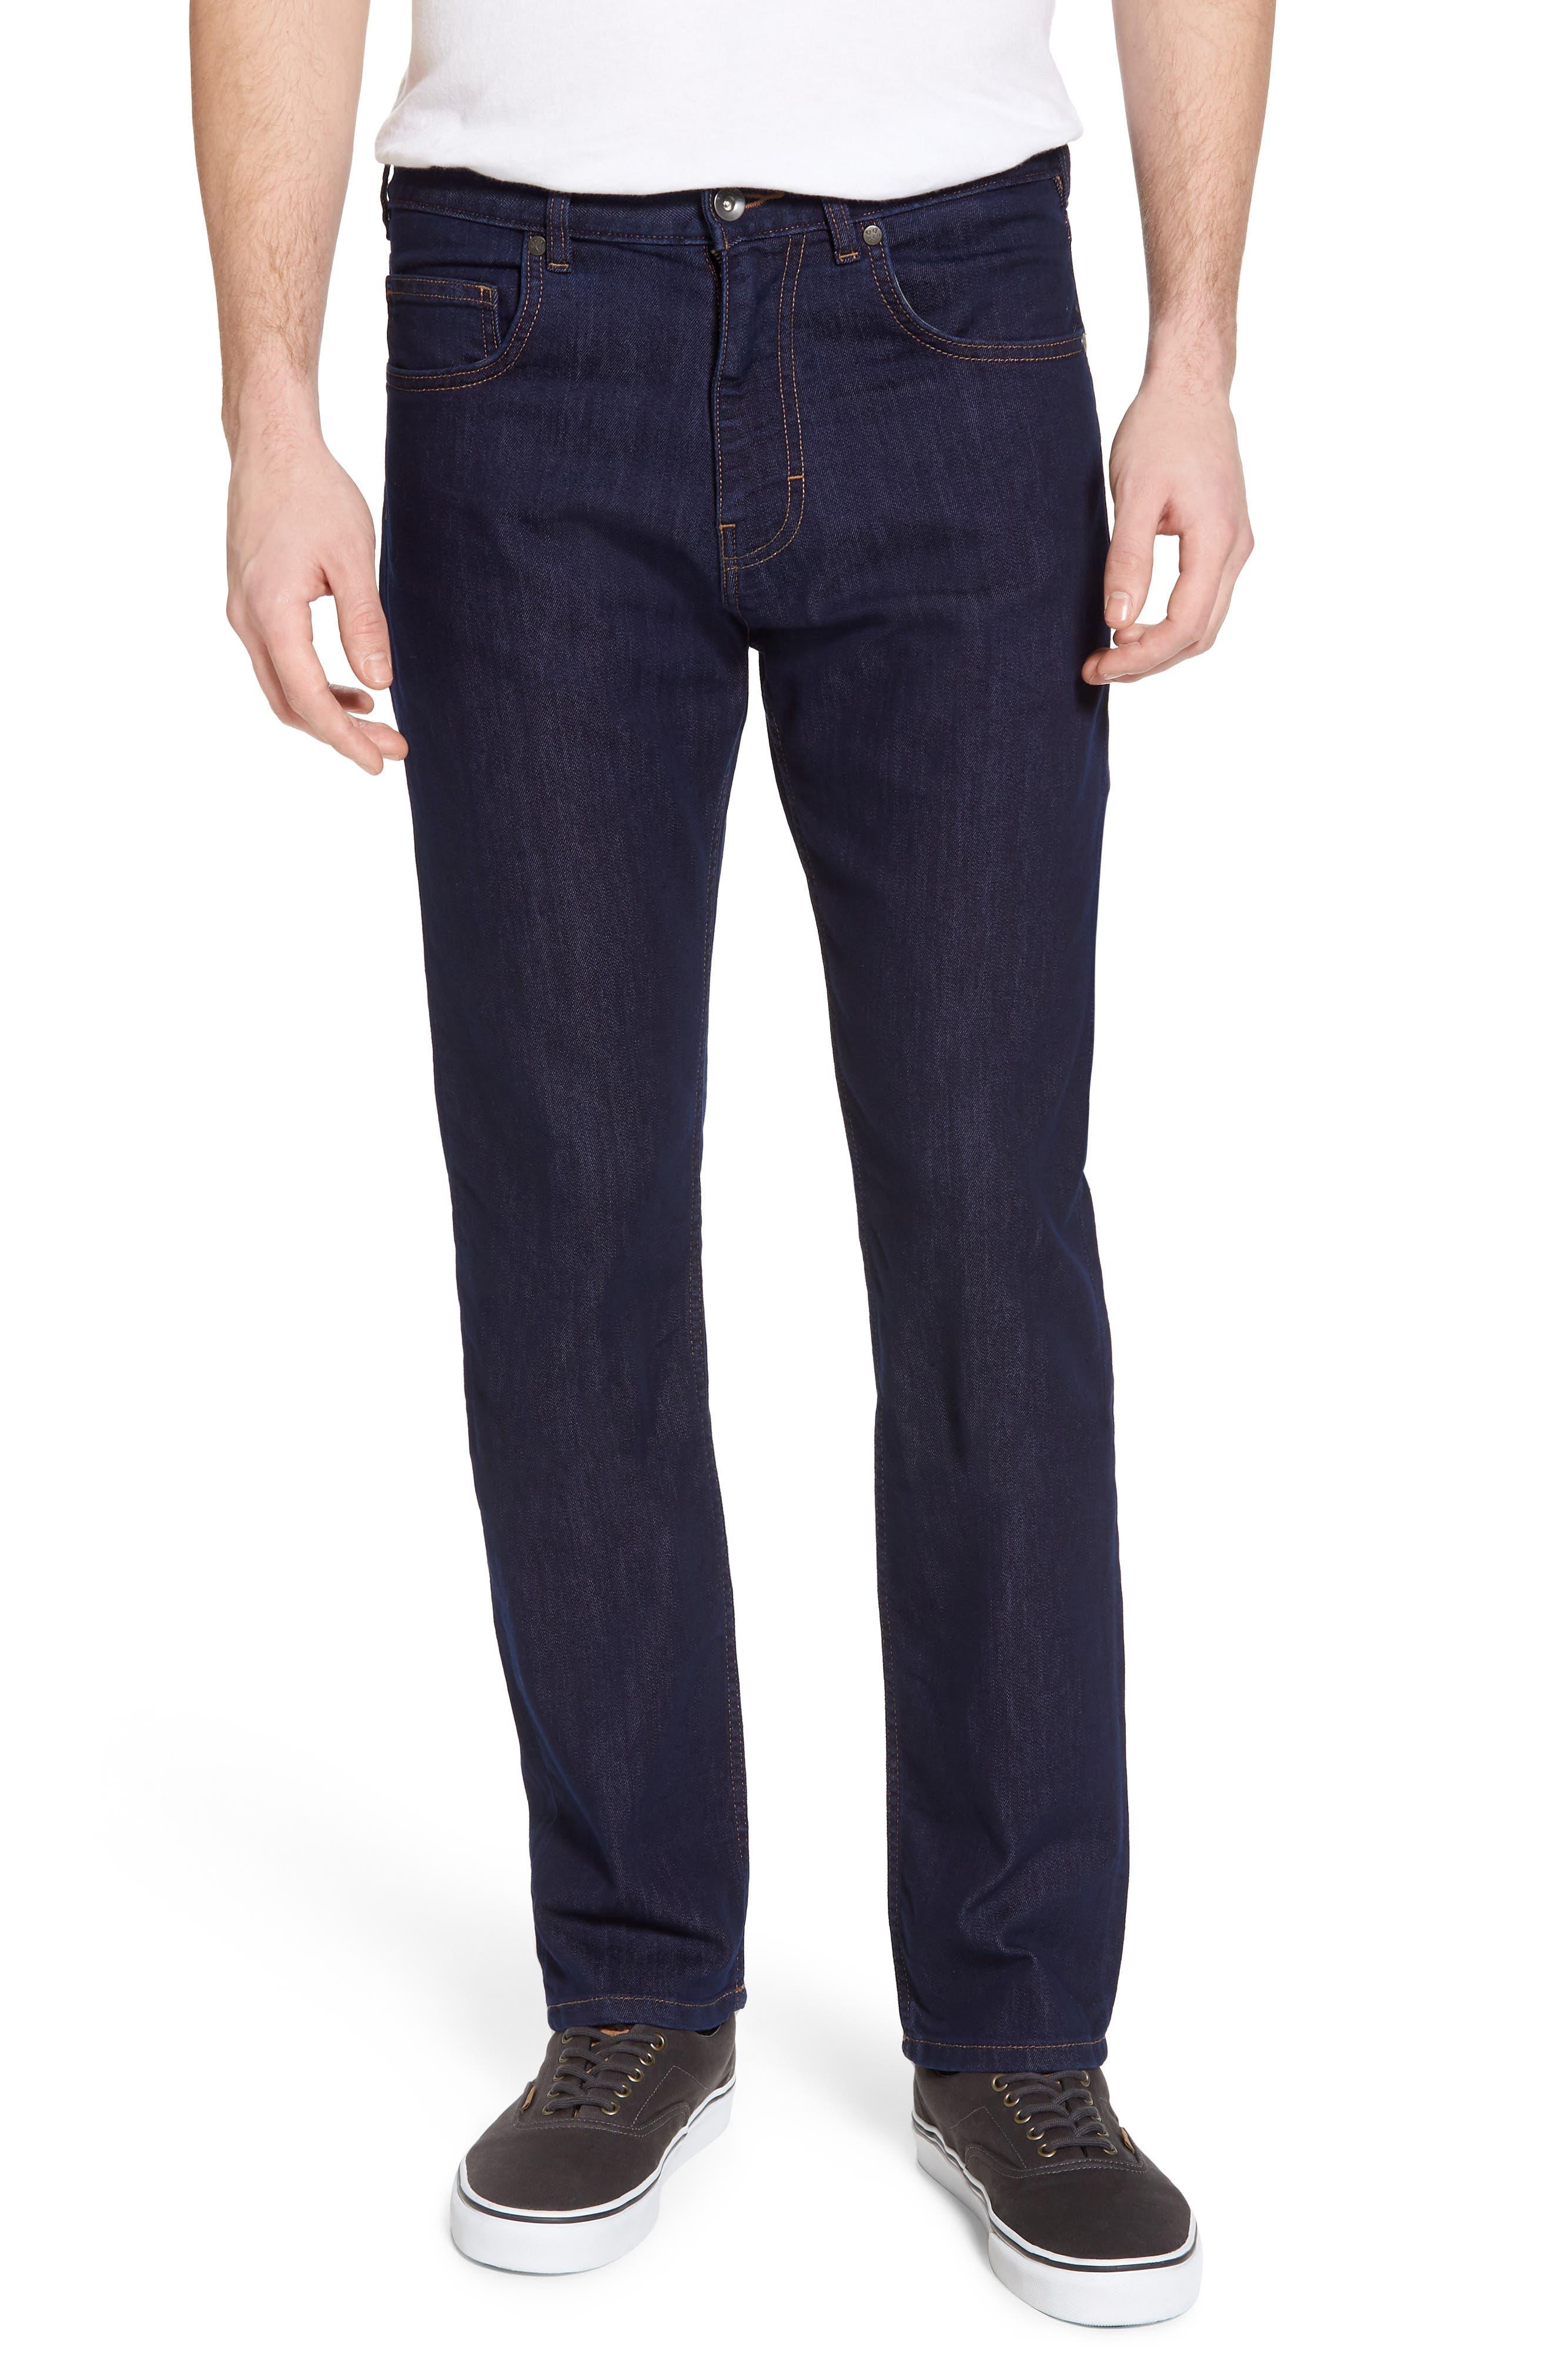 Straight Leg Performance Jeans,                             Main thumbnail 1, color,                             Dark Denim